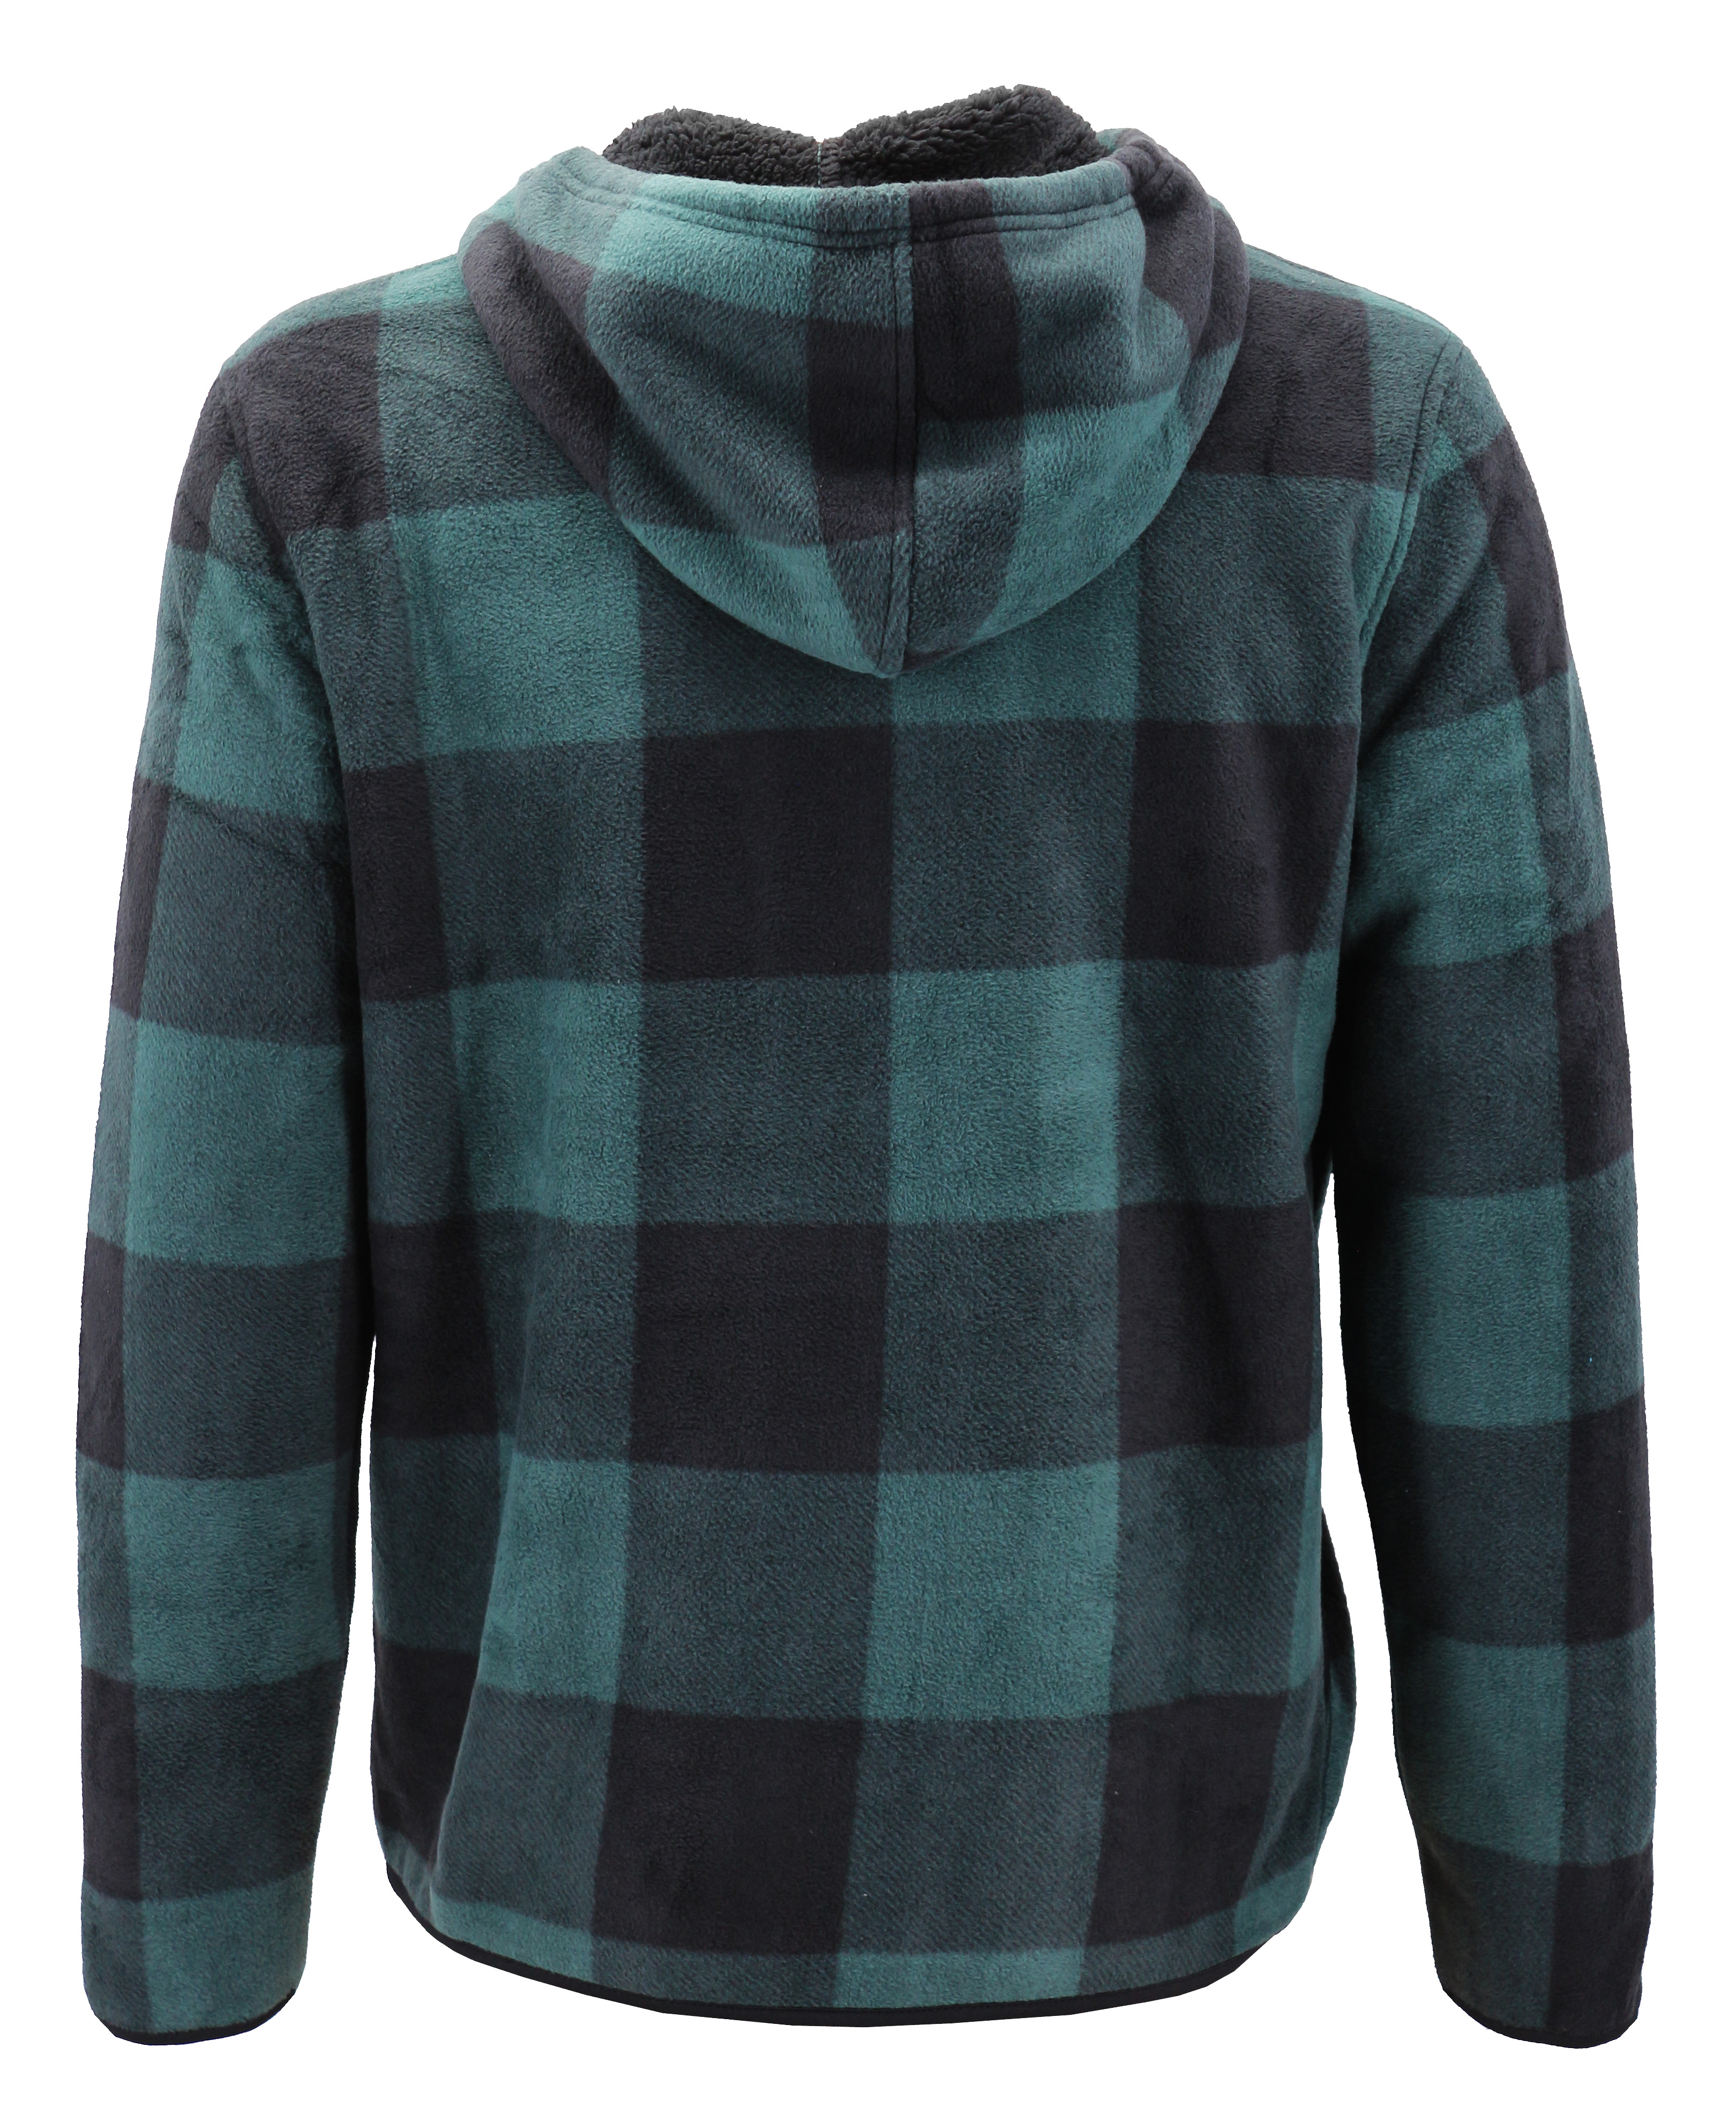 Men-039-s-Casual-Flannel-Zip-Up-Fleece-Lined-Plaid-Sherpa-Hoodie-Lightweight-Jacket thumbnail 6